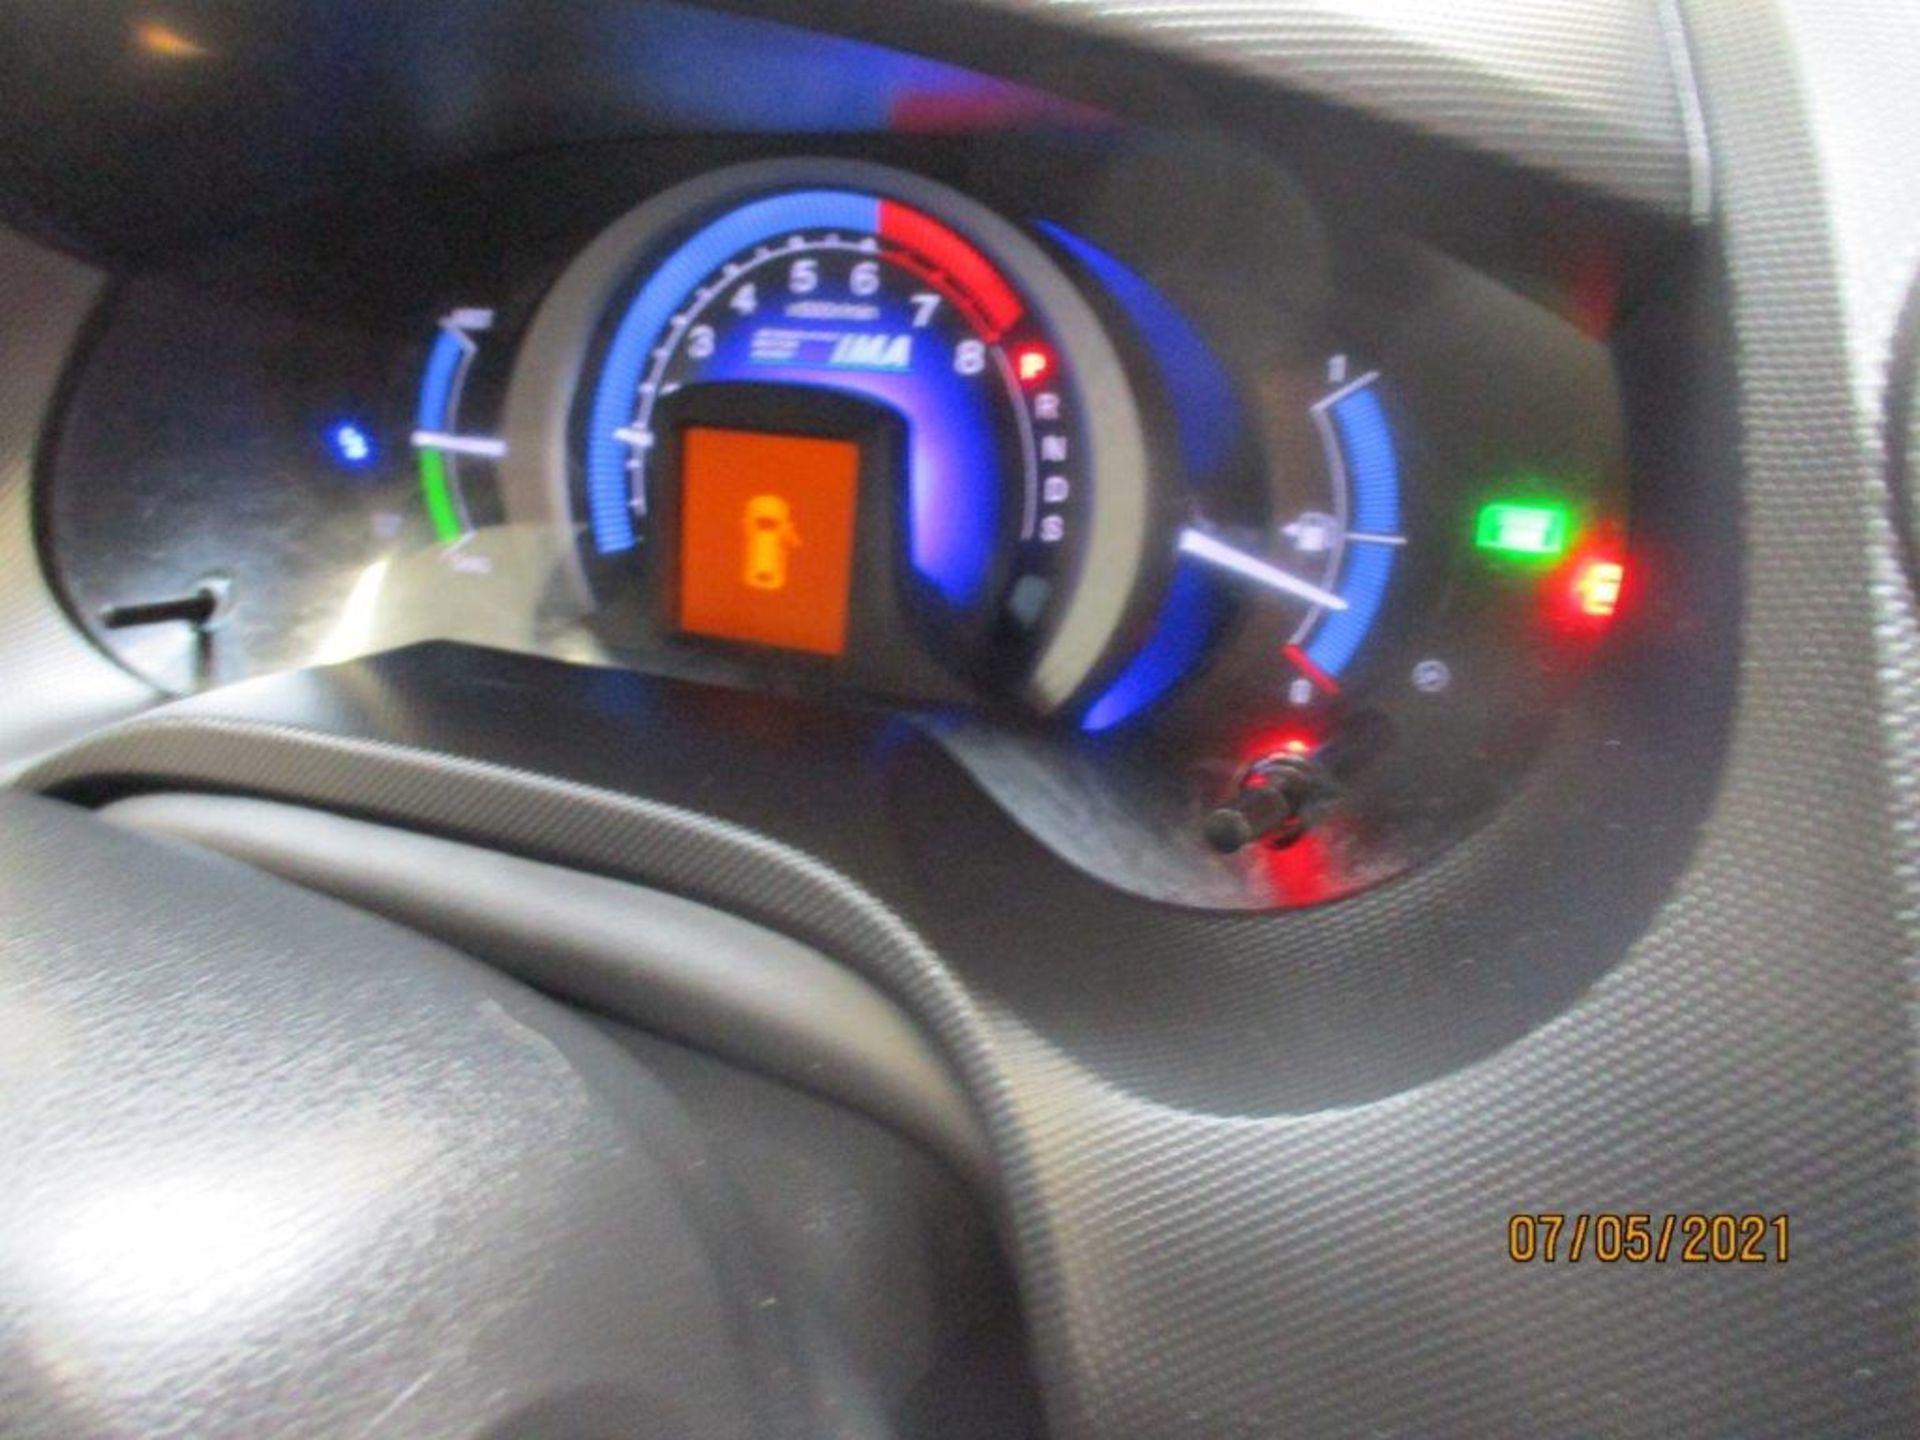 11 11 Honda Insight ES CVT - Image 20 of 21